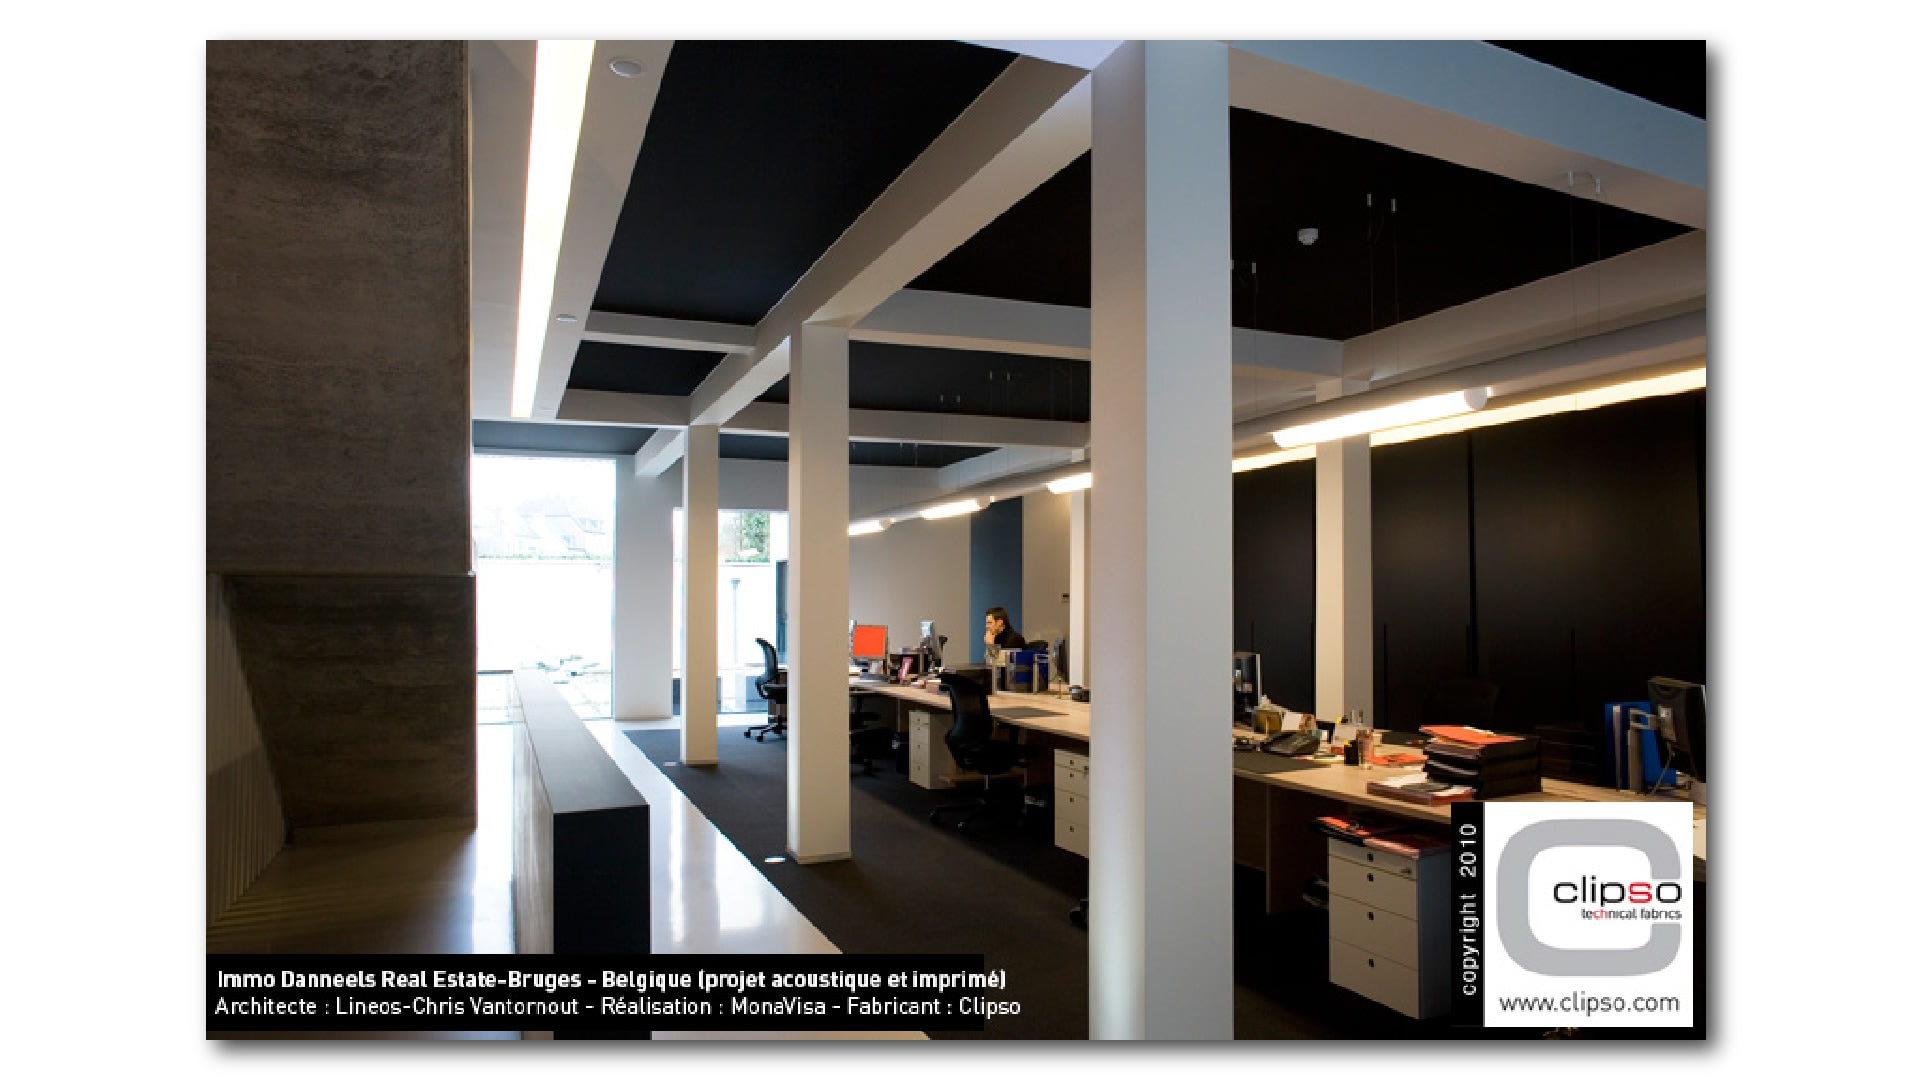 Clipso-Acoustic-Schwarz-im-Büro-01_xvtdfo